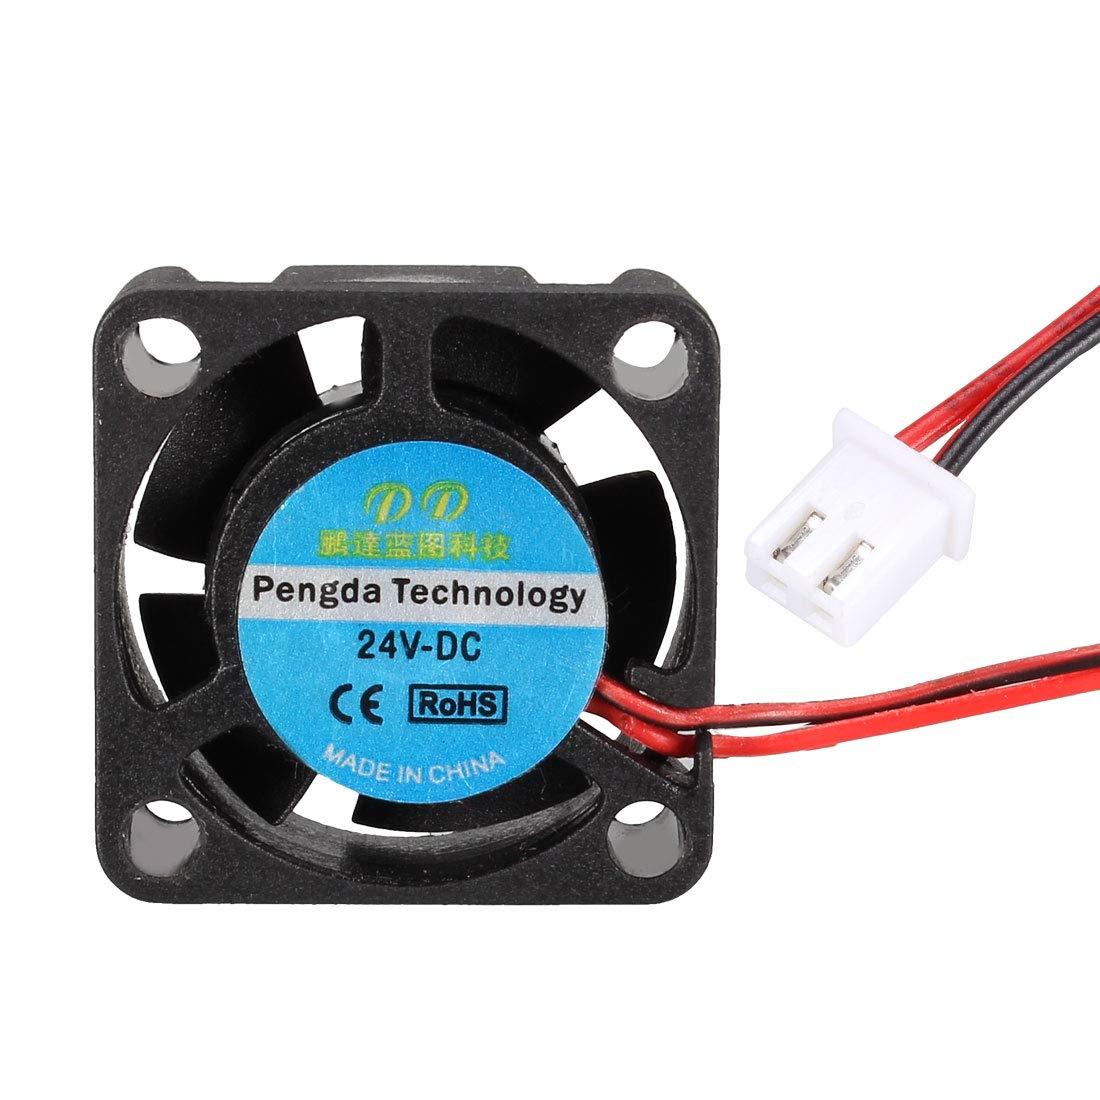 uxcell 25mmx25mmx10mm Cooling Fan DC 24V for 3D Printer Extruder Hotend 2pcs